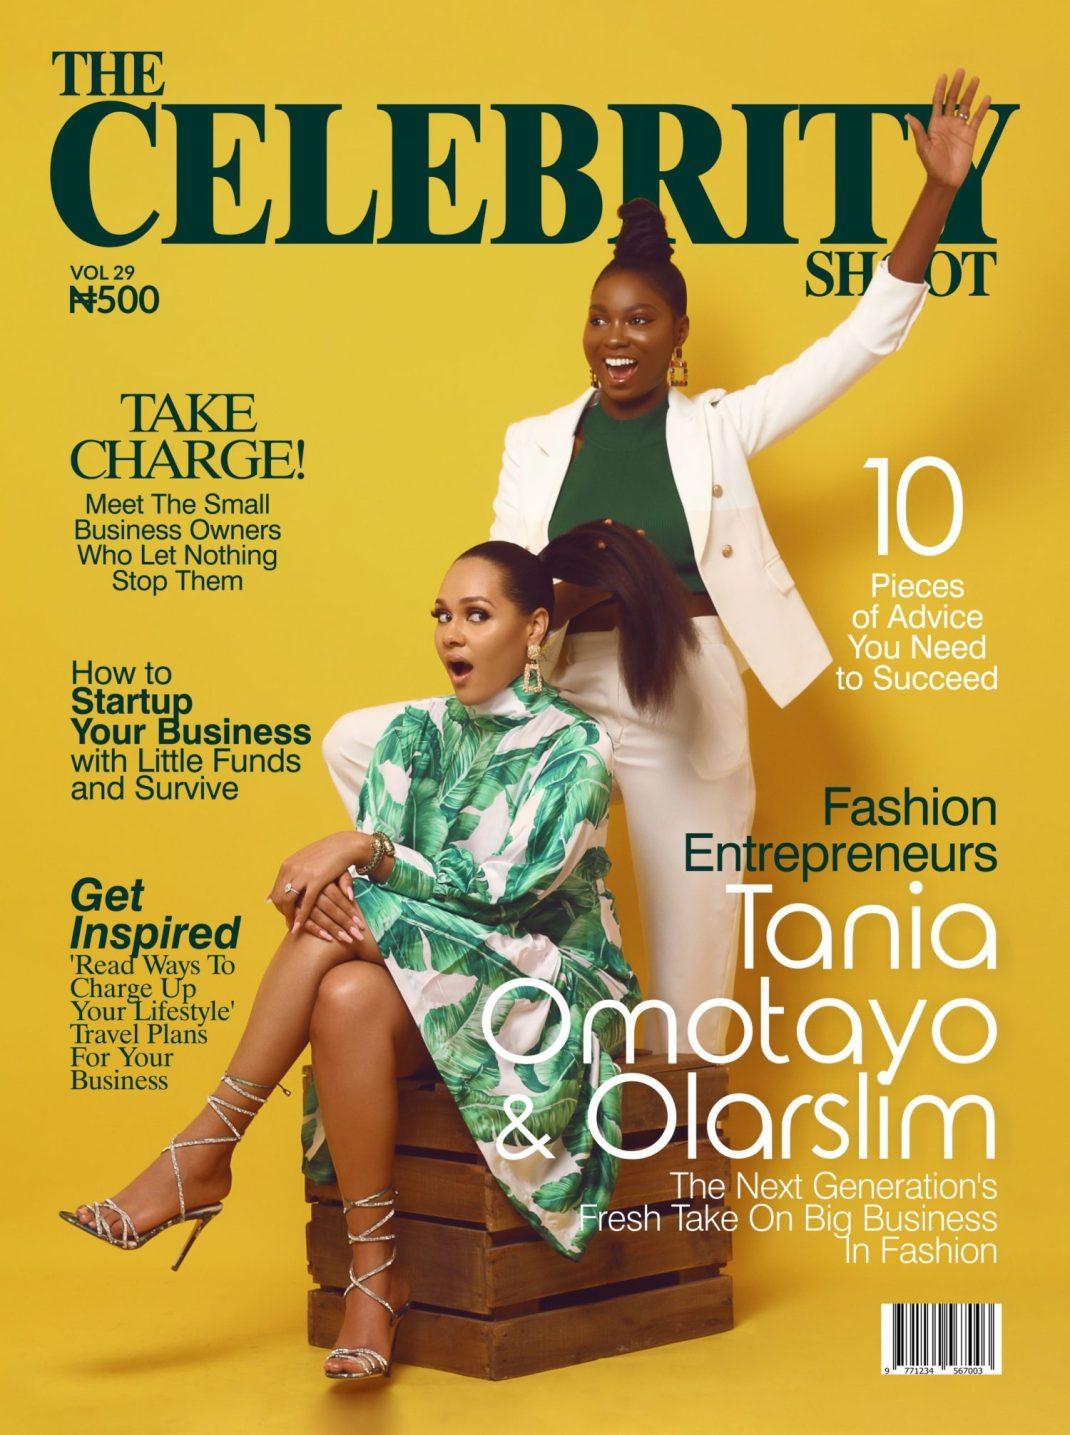 Taniah Omotayo and Olar Slim Stun on the Cover of The Celebrity Shoot Magazine